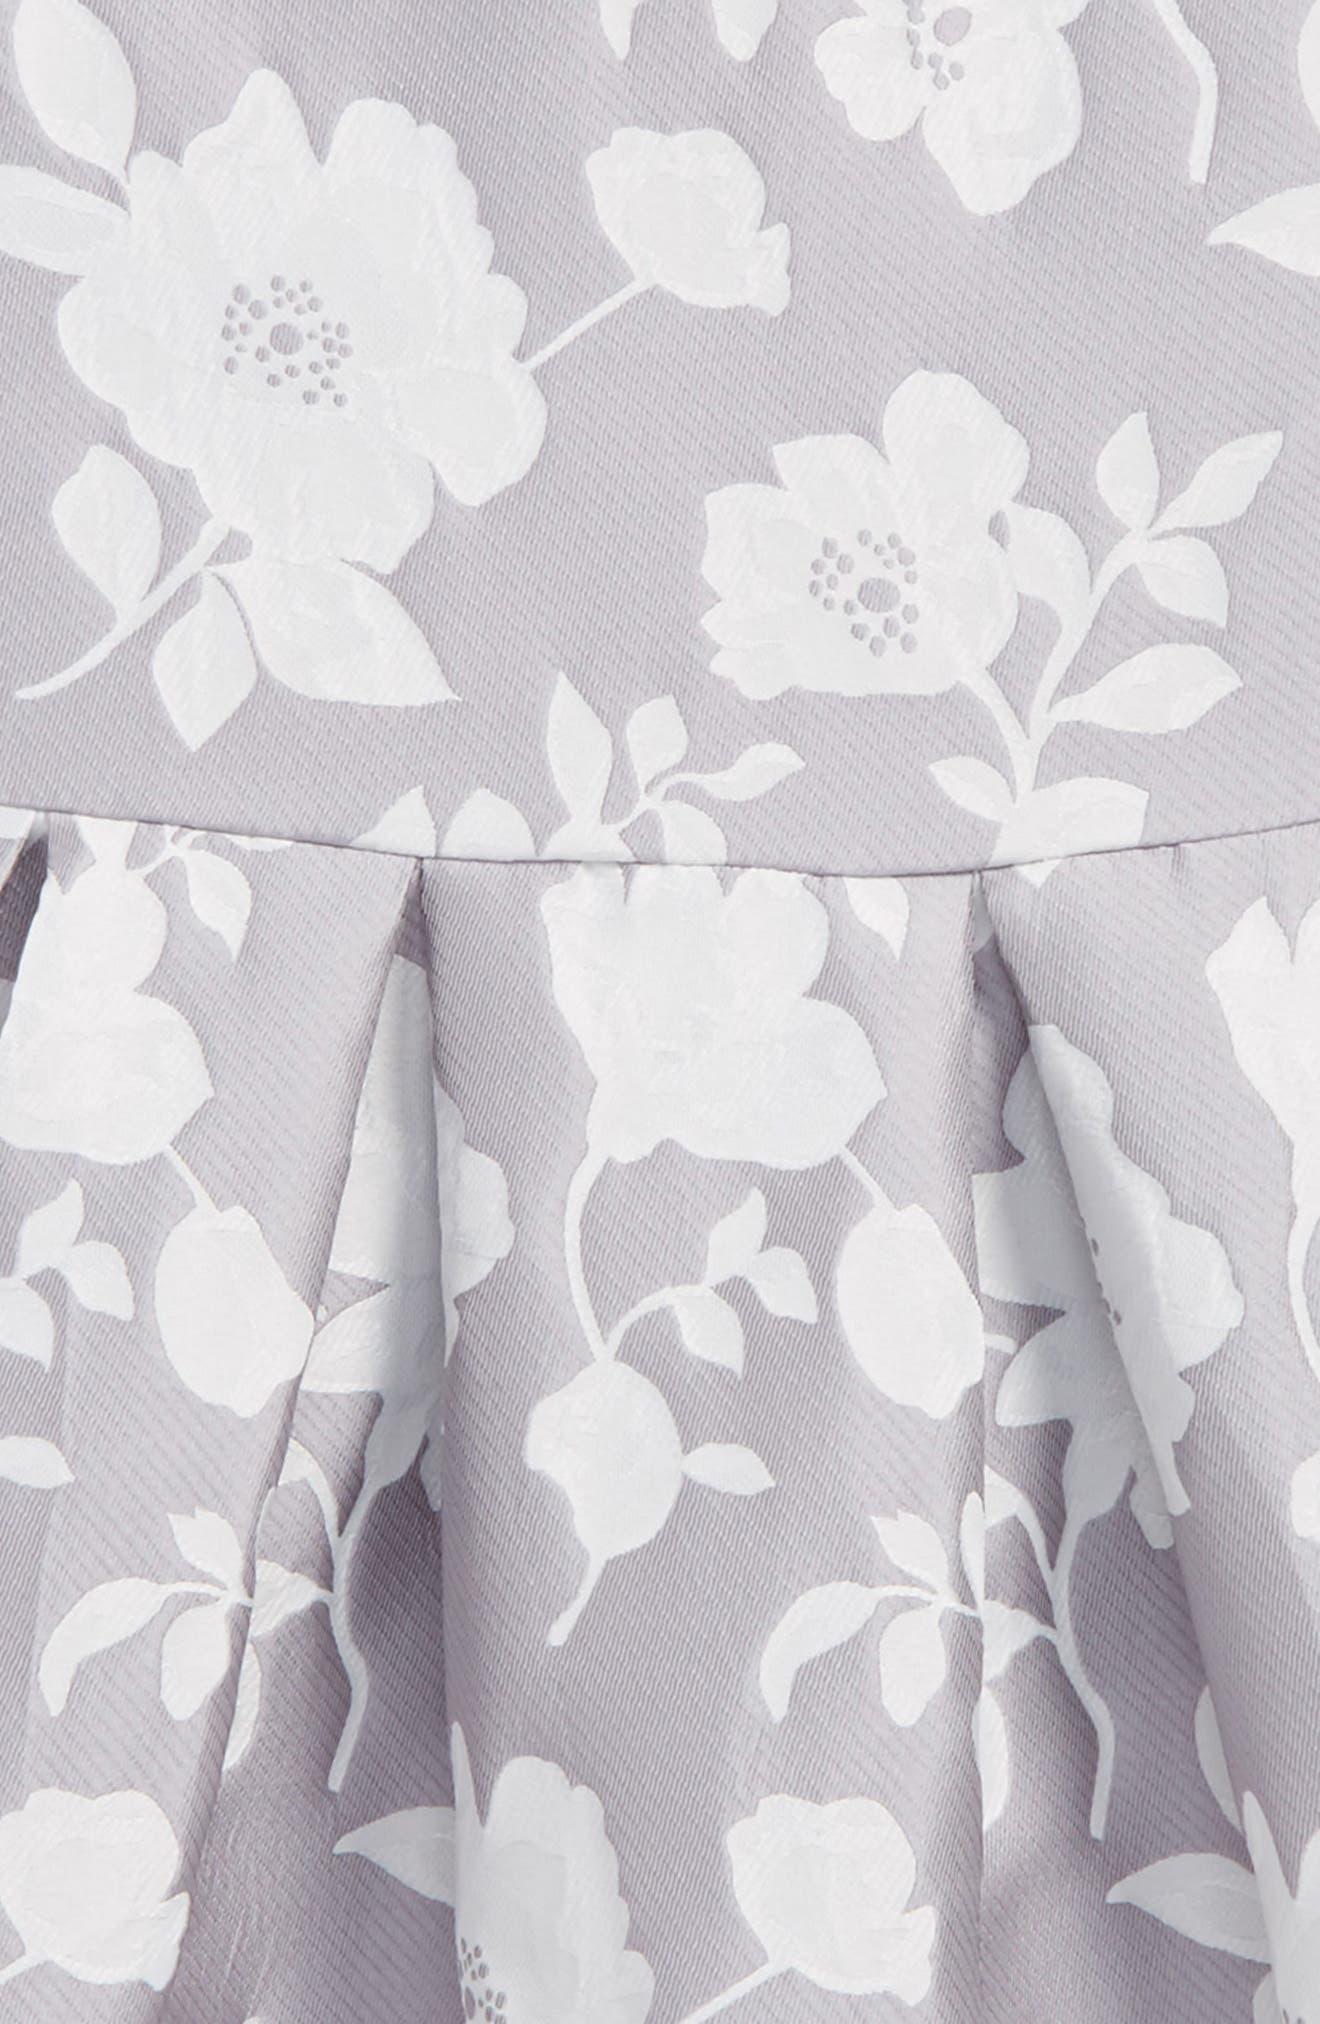 Floral Jacquard Dress,                             Alternate thumbnail 3, color,                             020